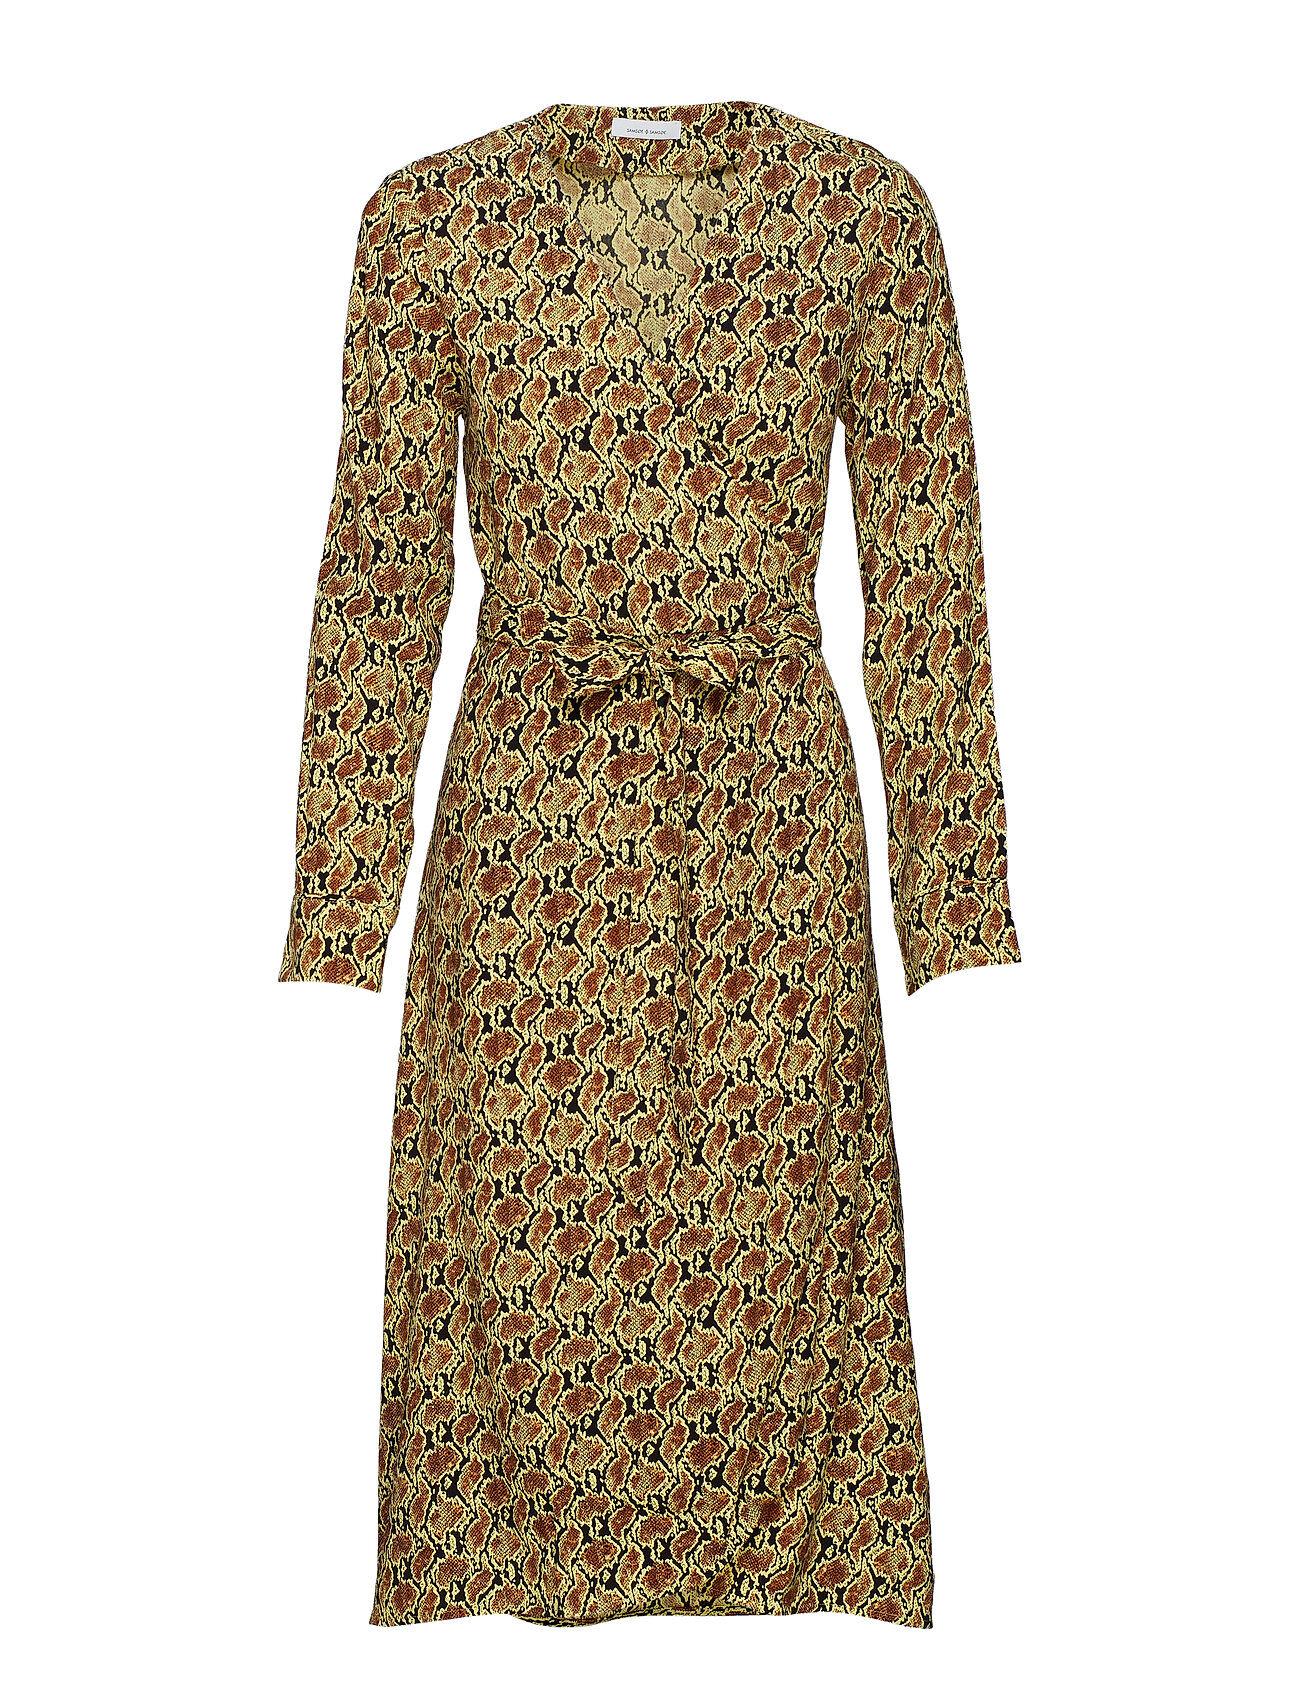 Samsøe & Samsøe Marigold Dress Aop 6515